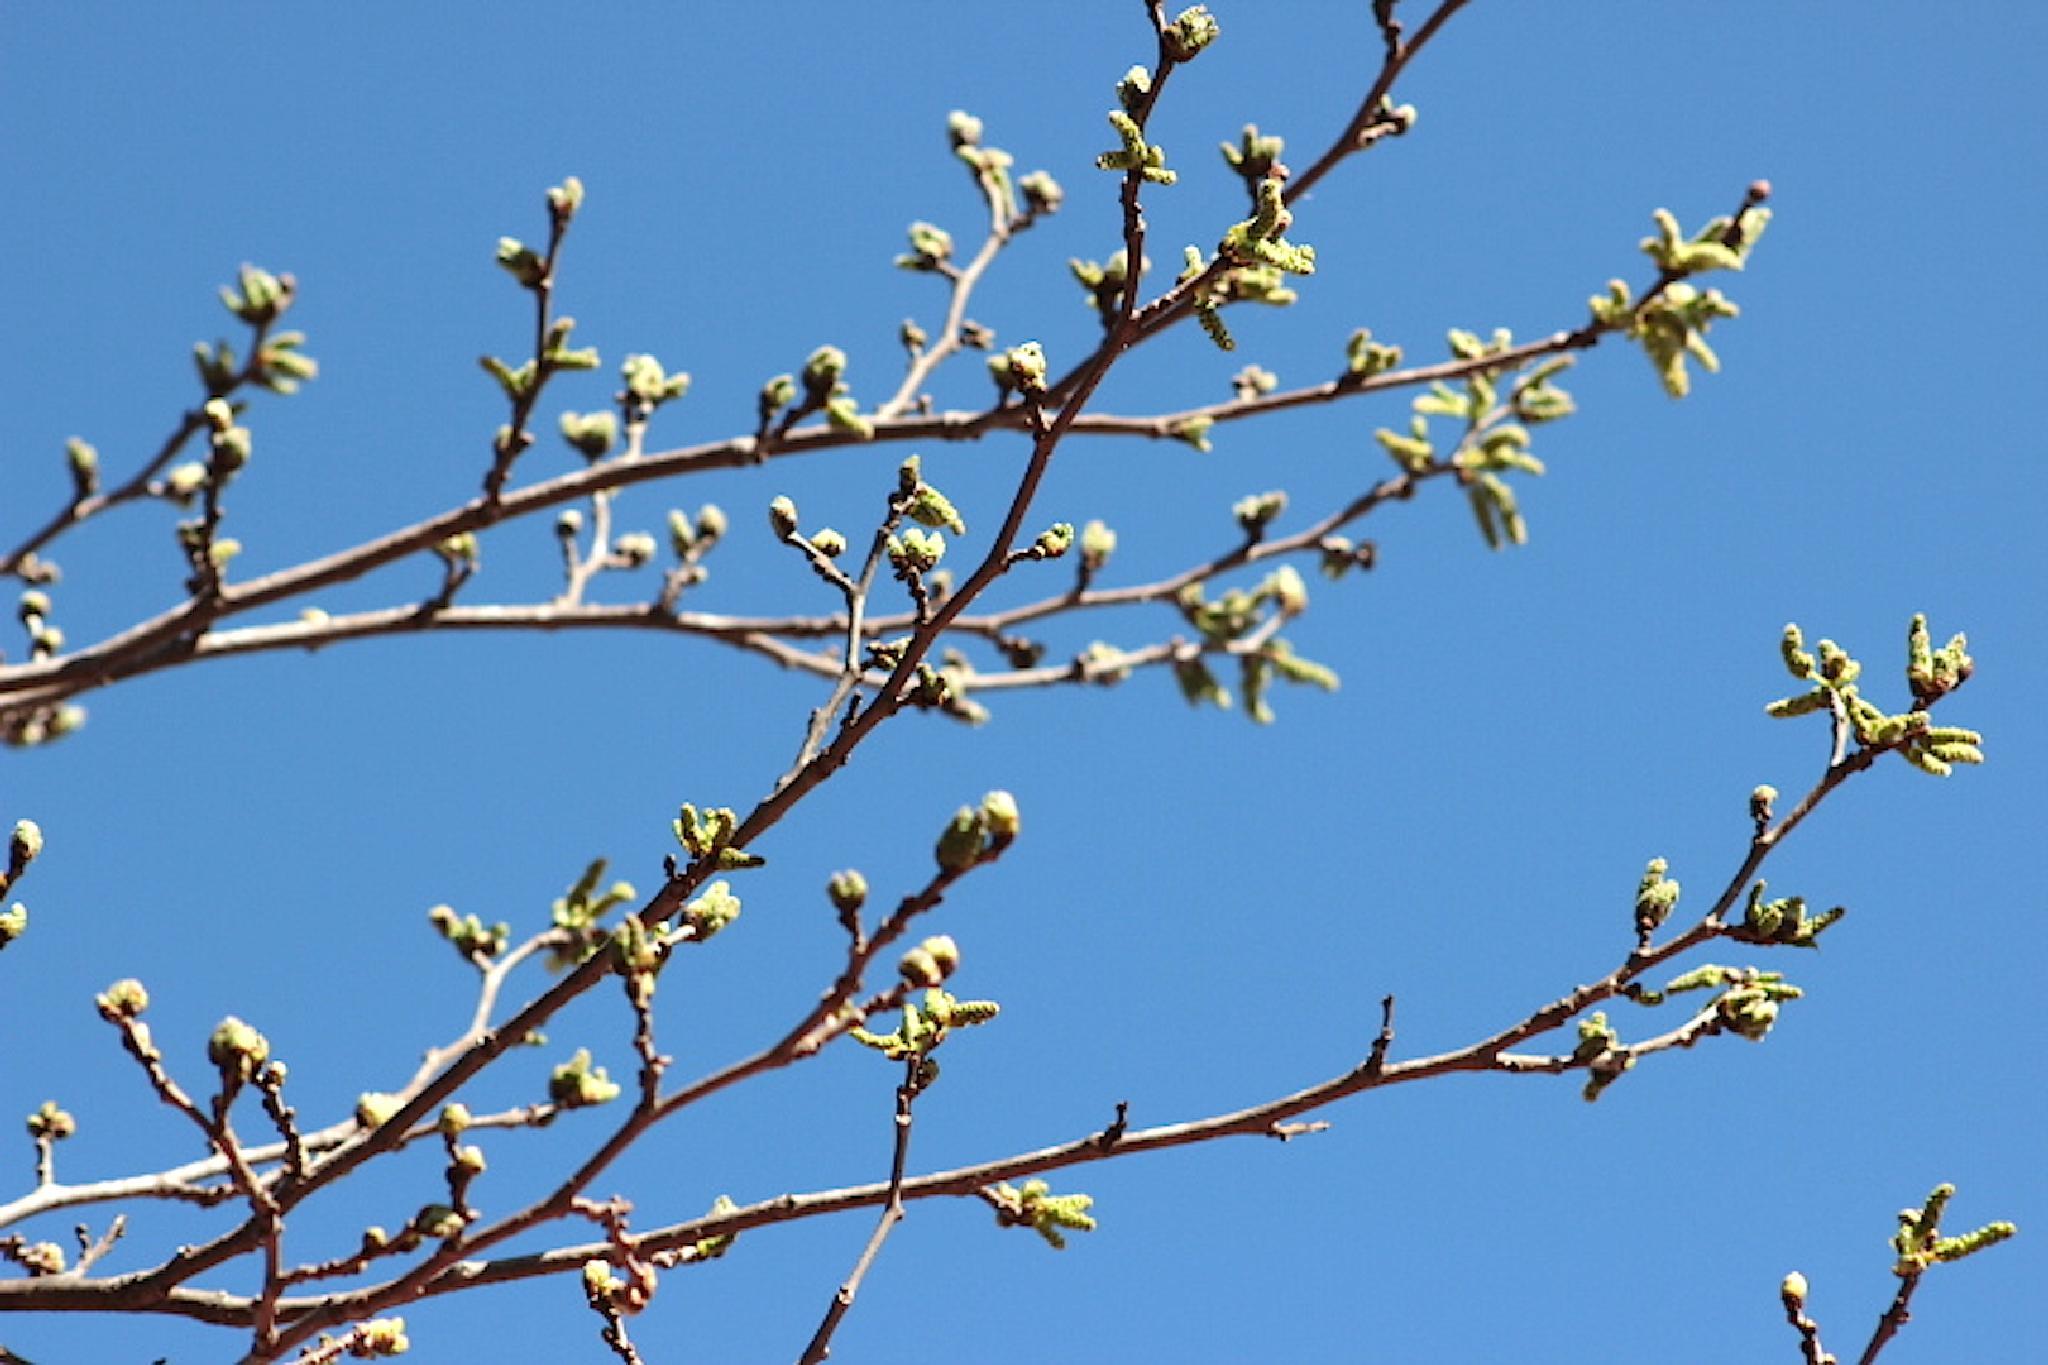 Budding Mulberry Tree by Enchanted Seashells by Princess Rosebud